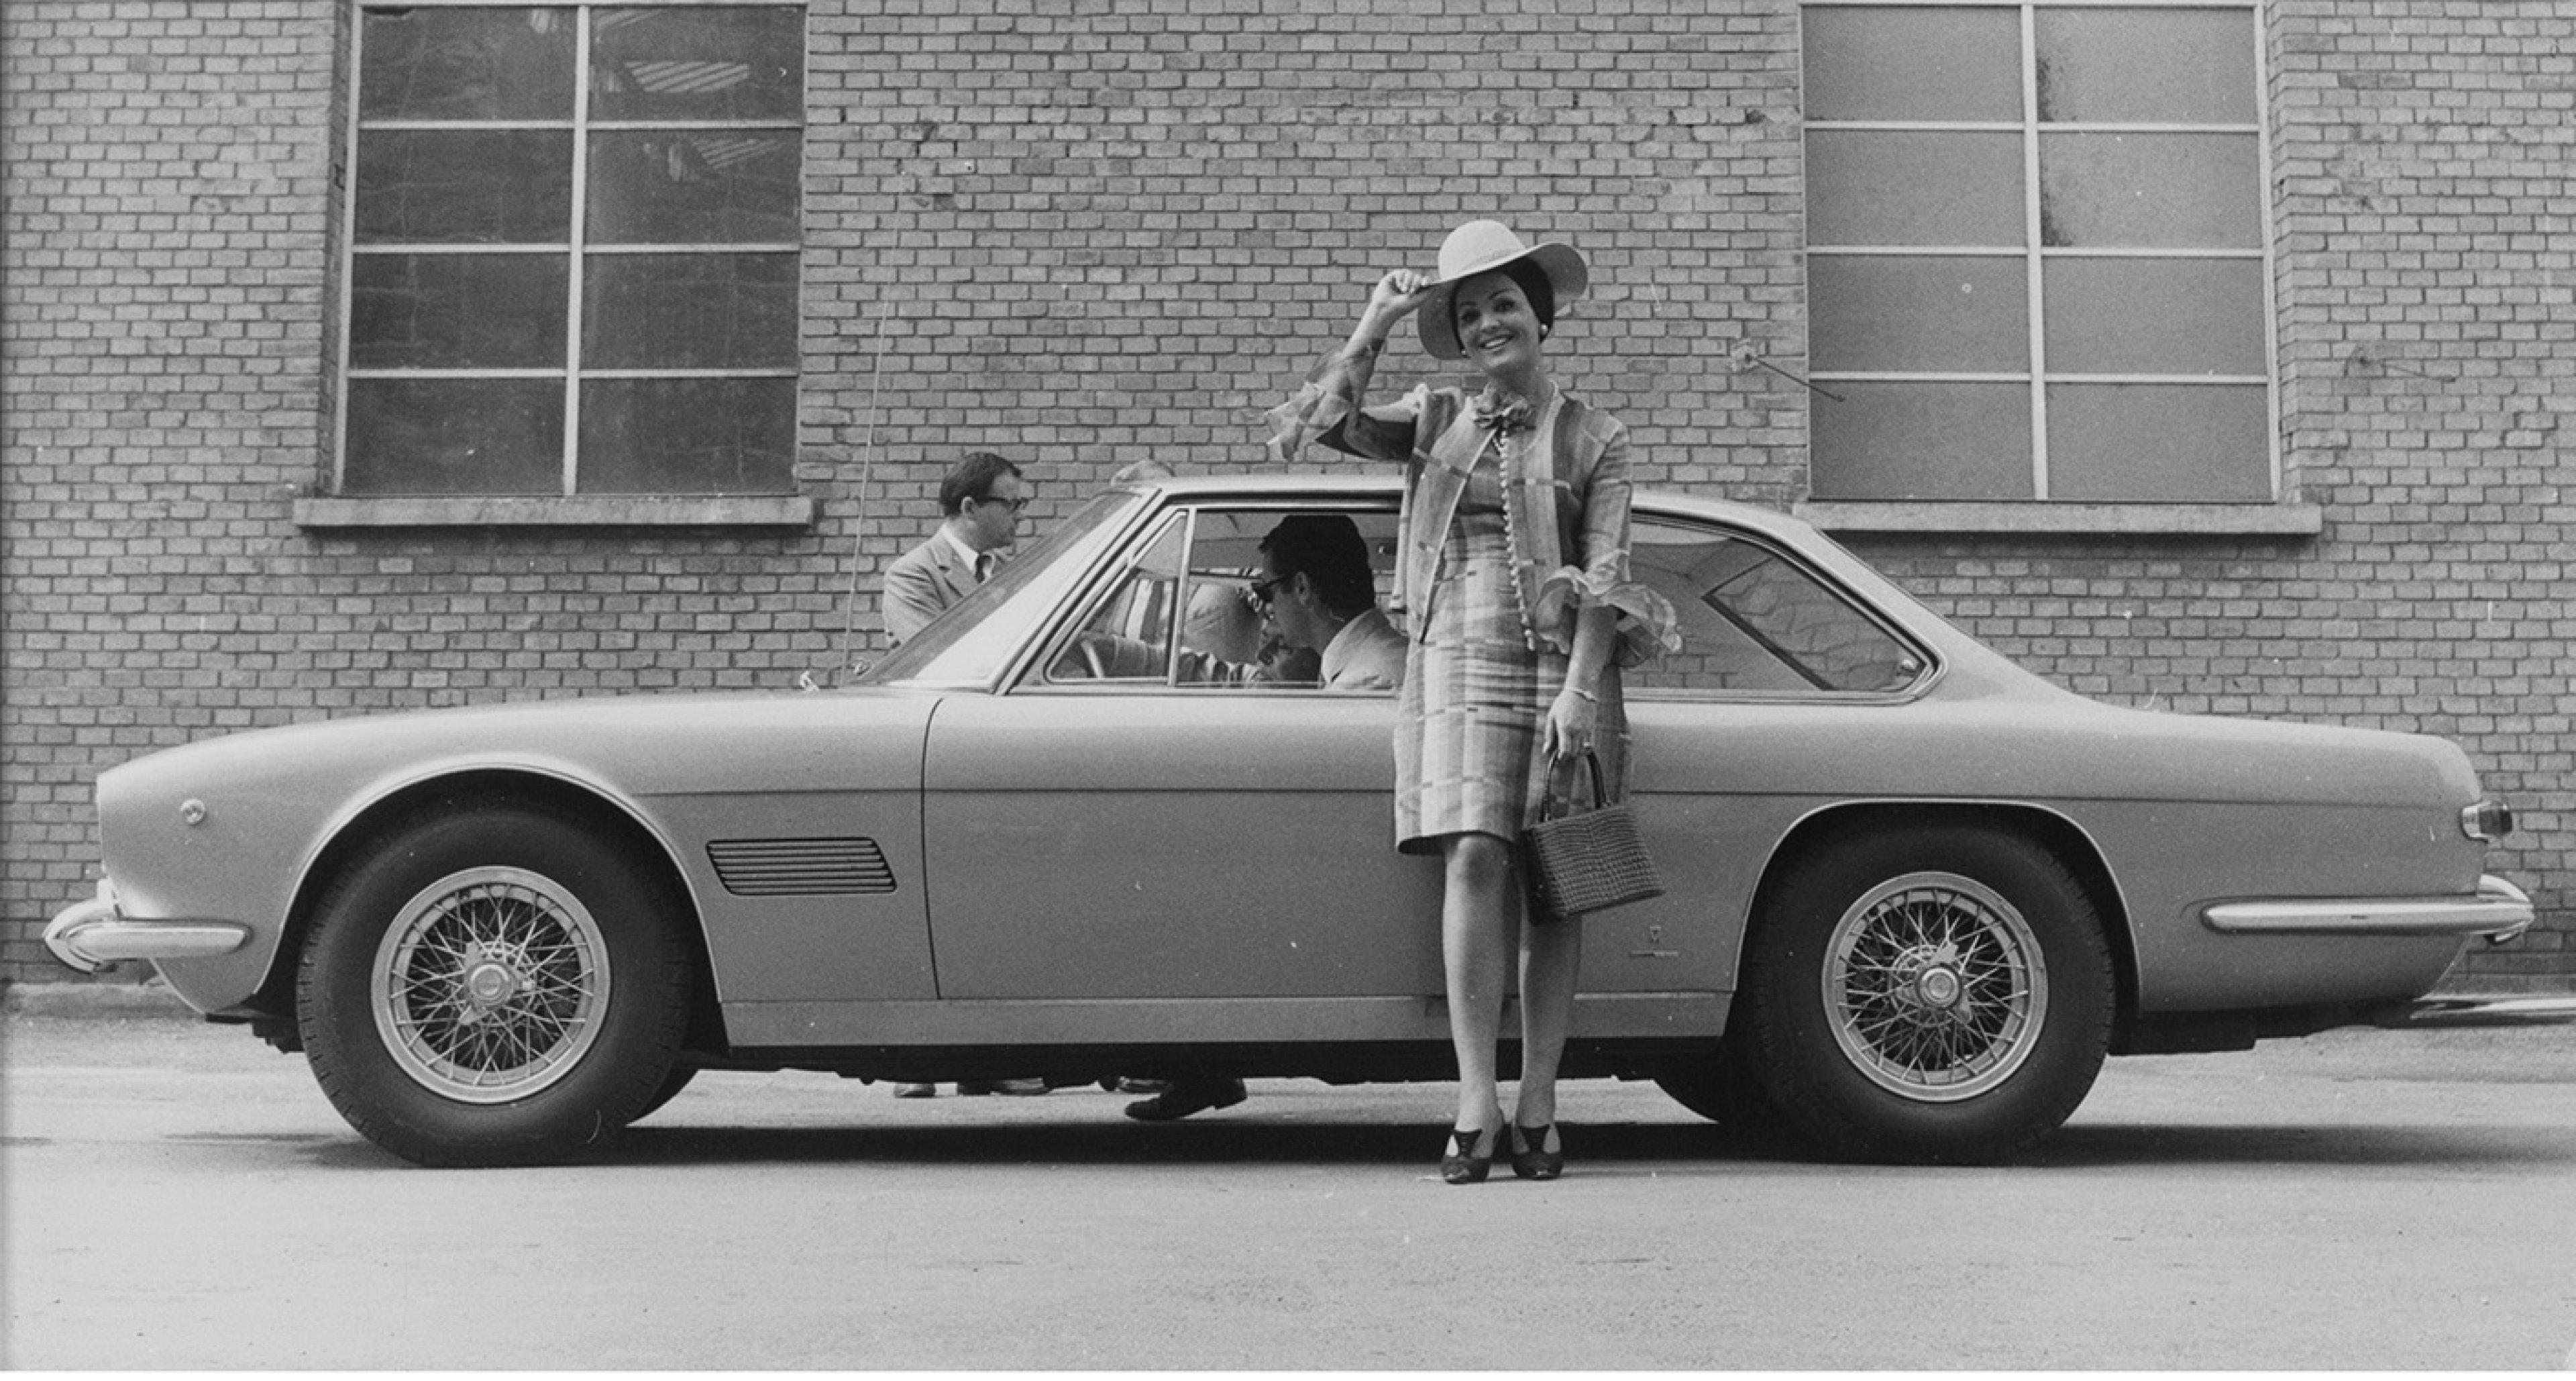 Moira Orfei and a Maserati Mexico